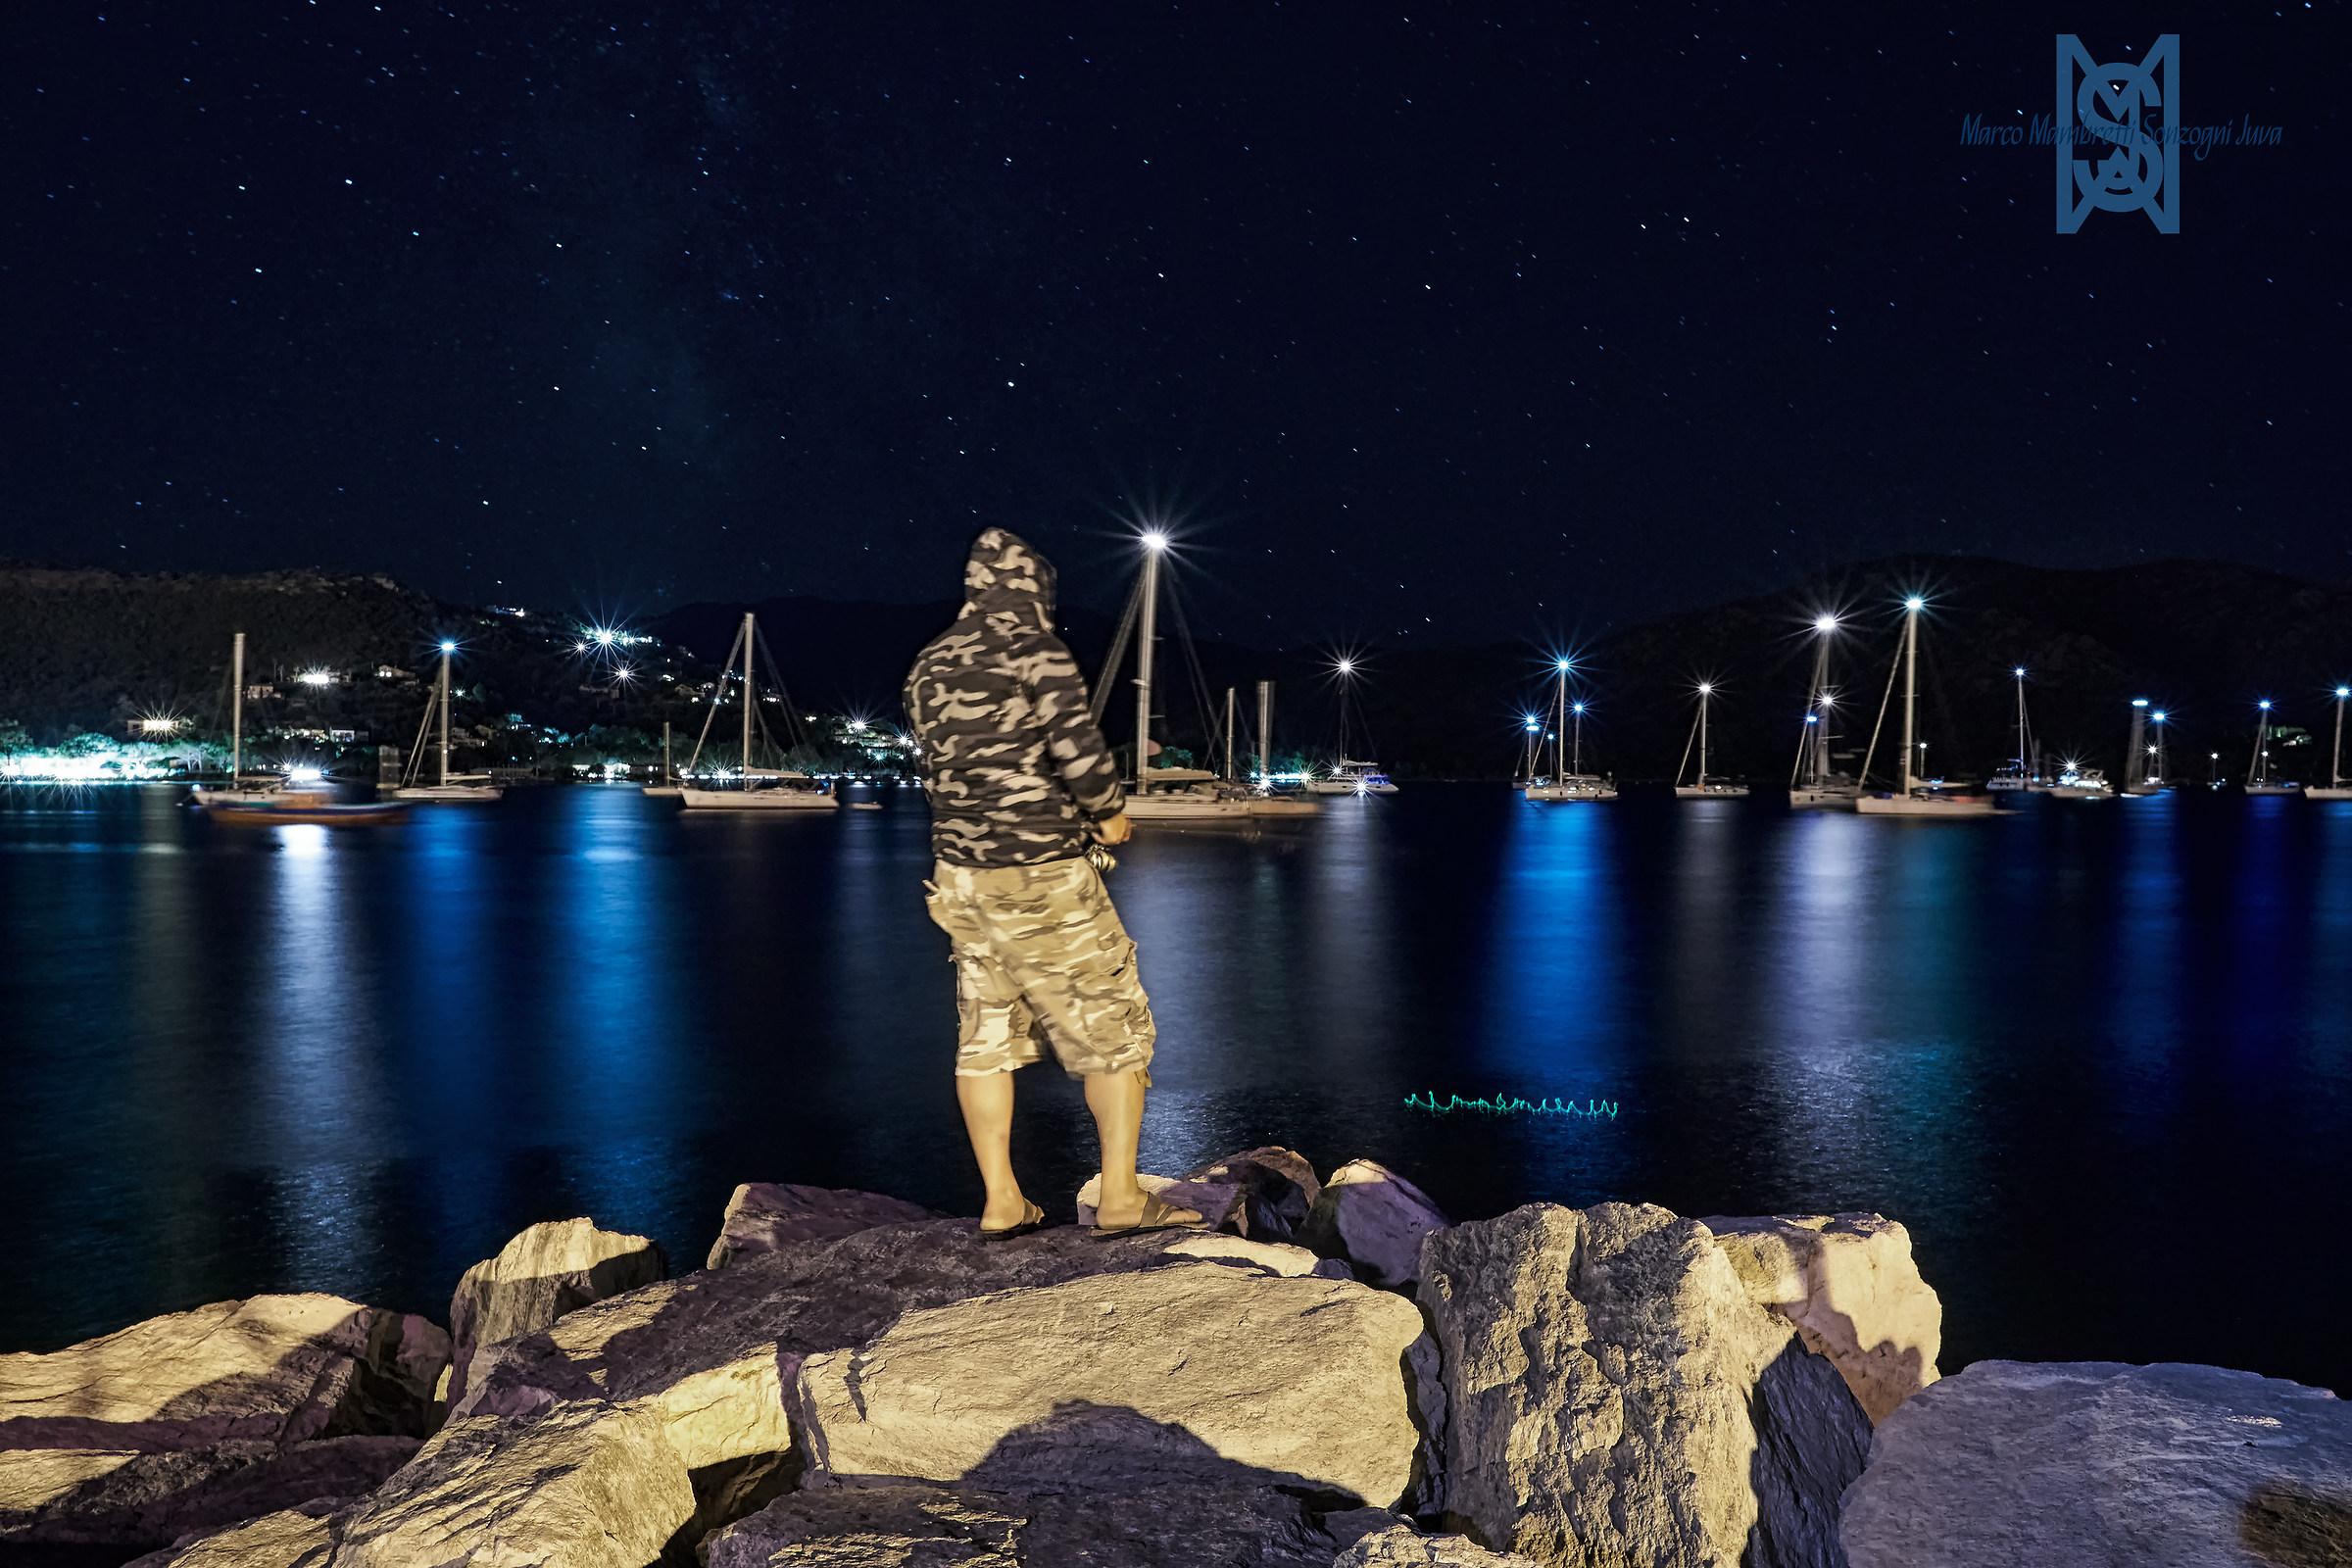 Pescatore di notte...